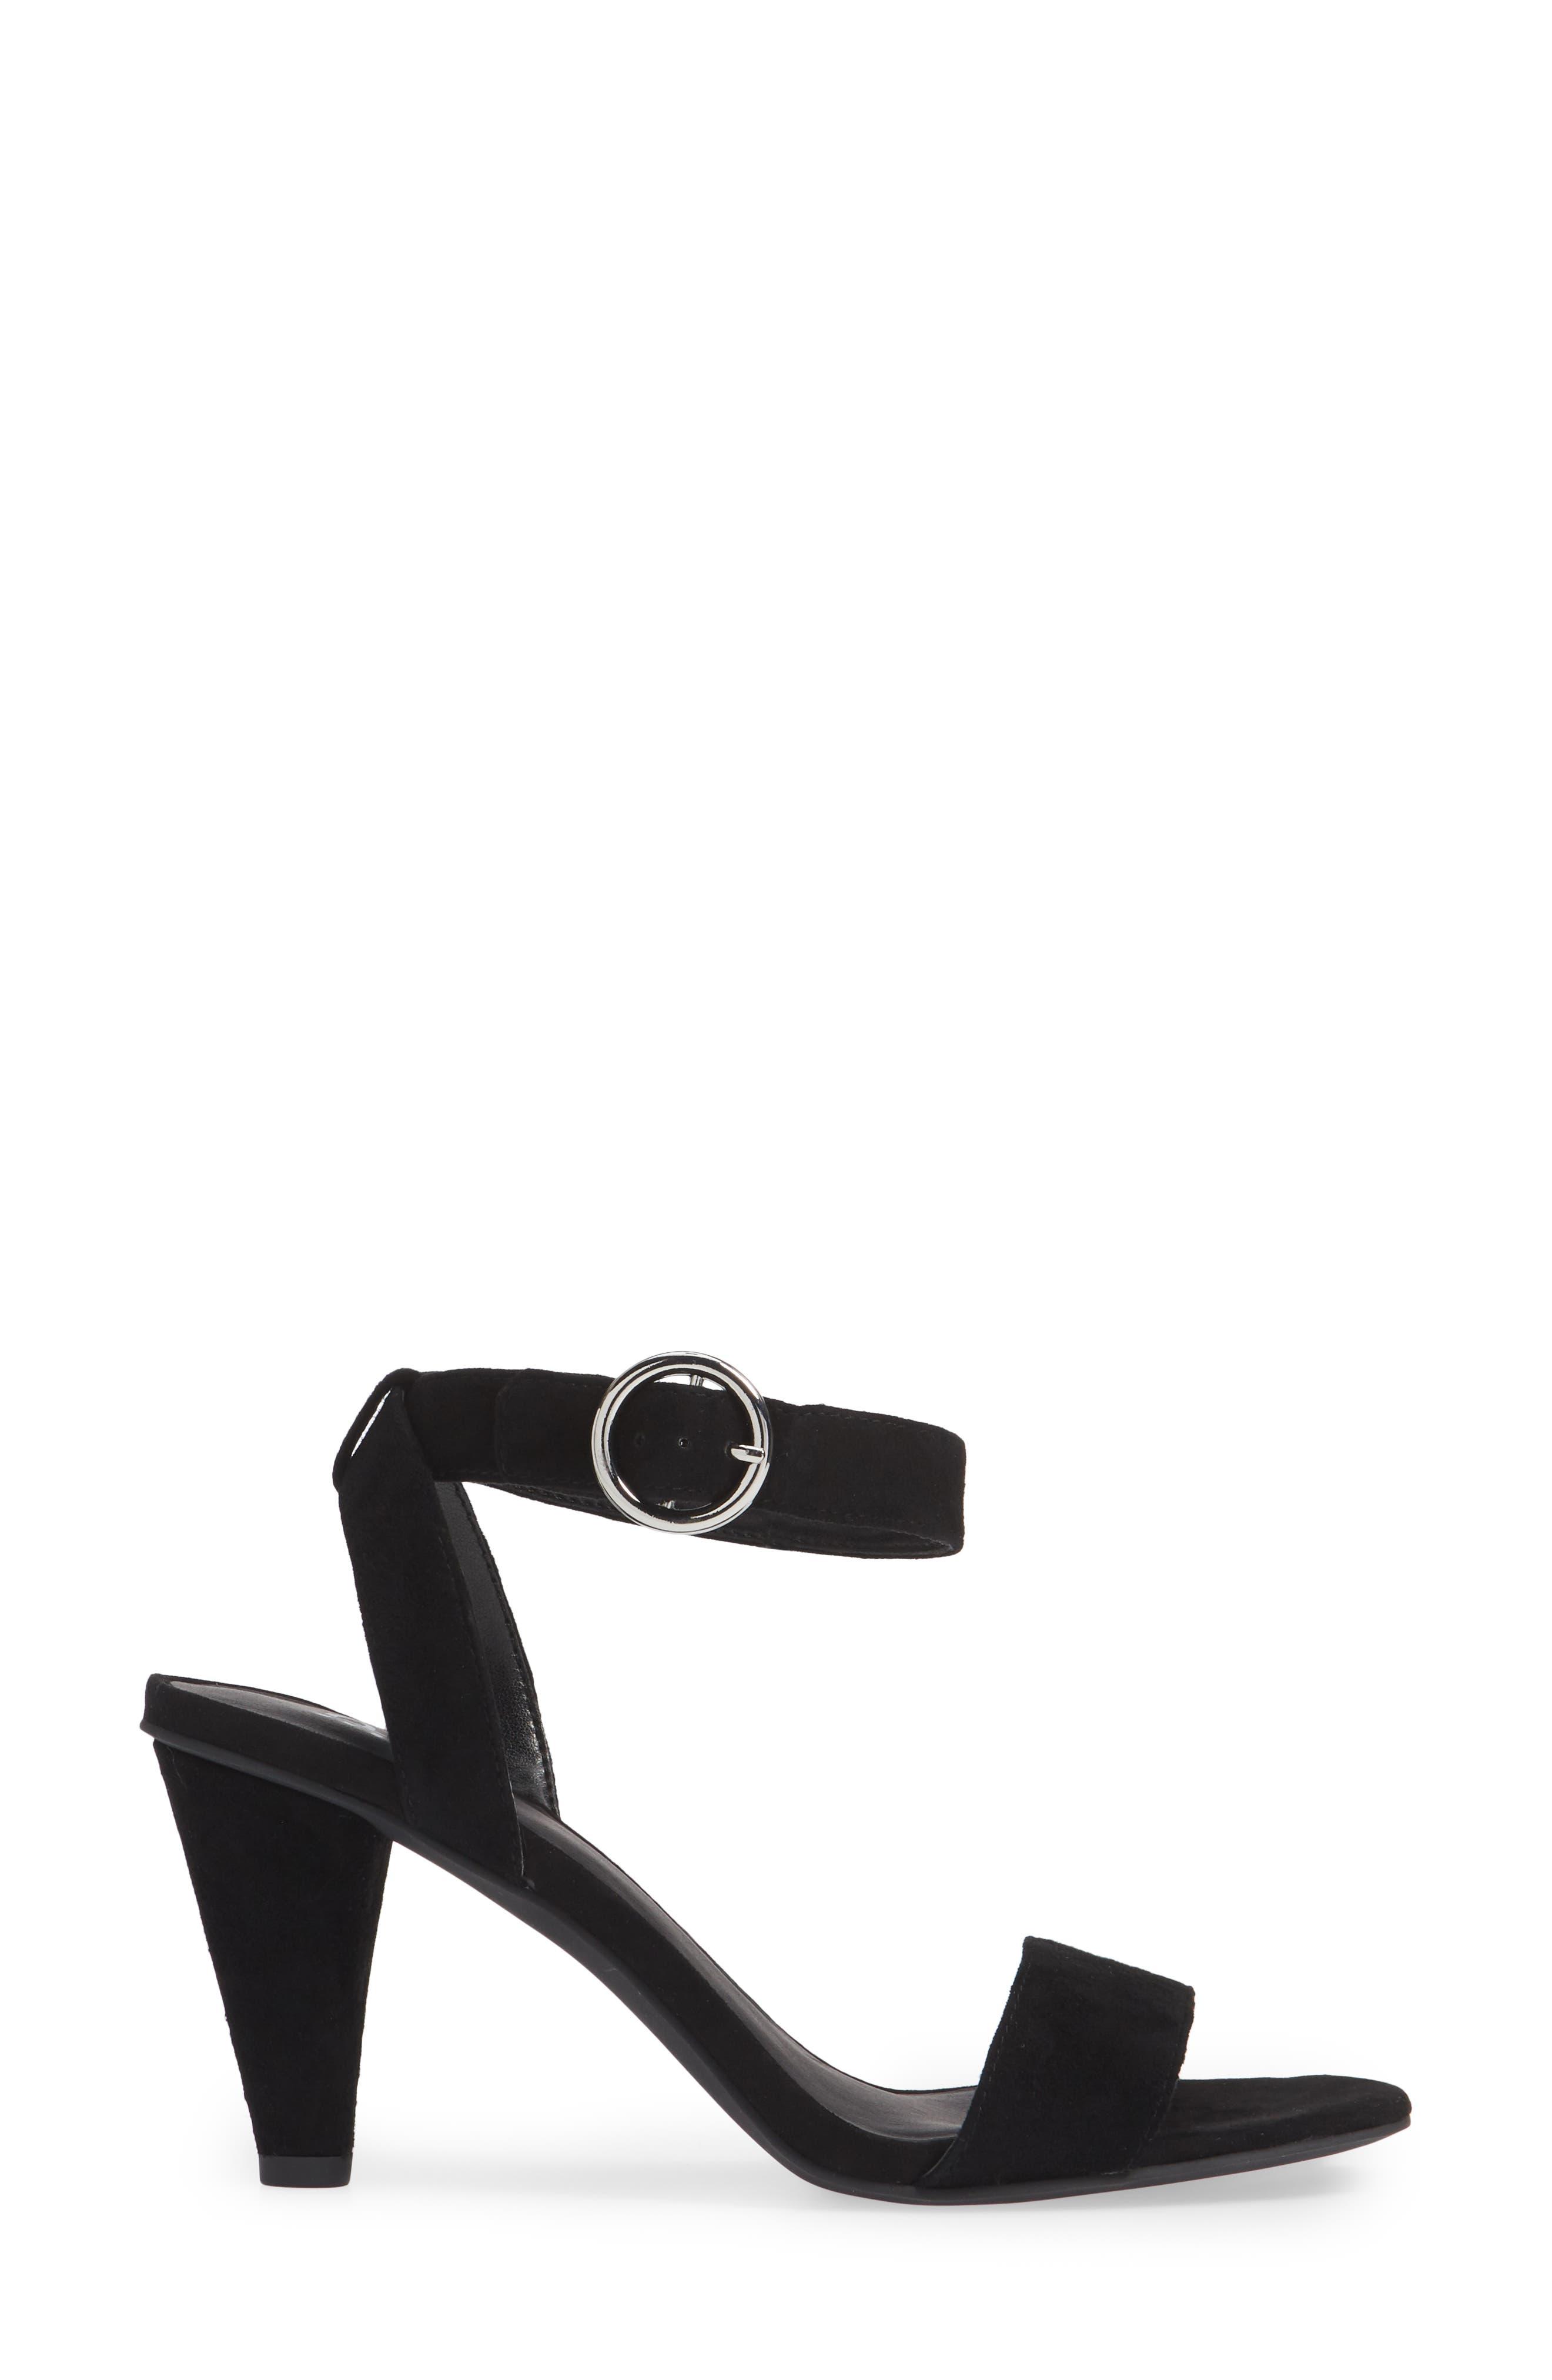 Cleo Cone Heel Sandal,                             Alternate thumbnail 3, color,                             BLACK SUEDE